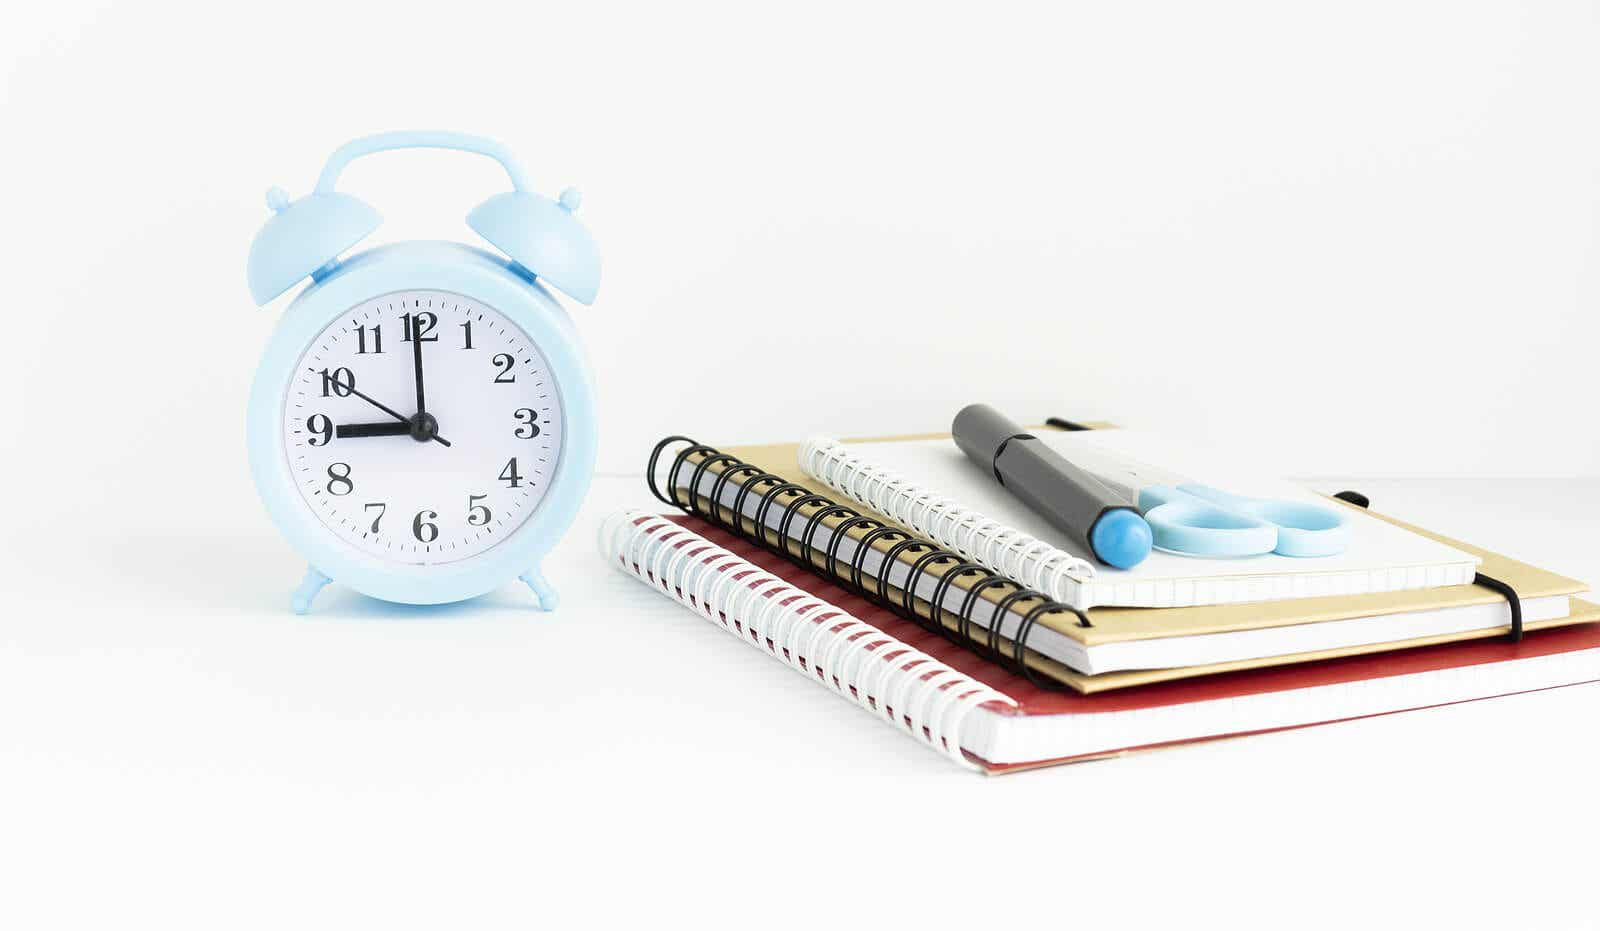 An alarm clock, notebooks, a pen, and scissors.